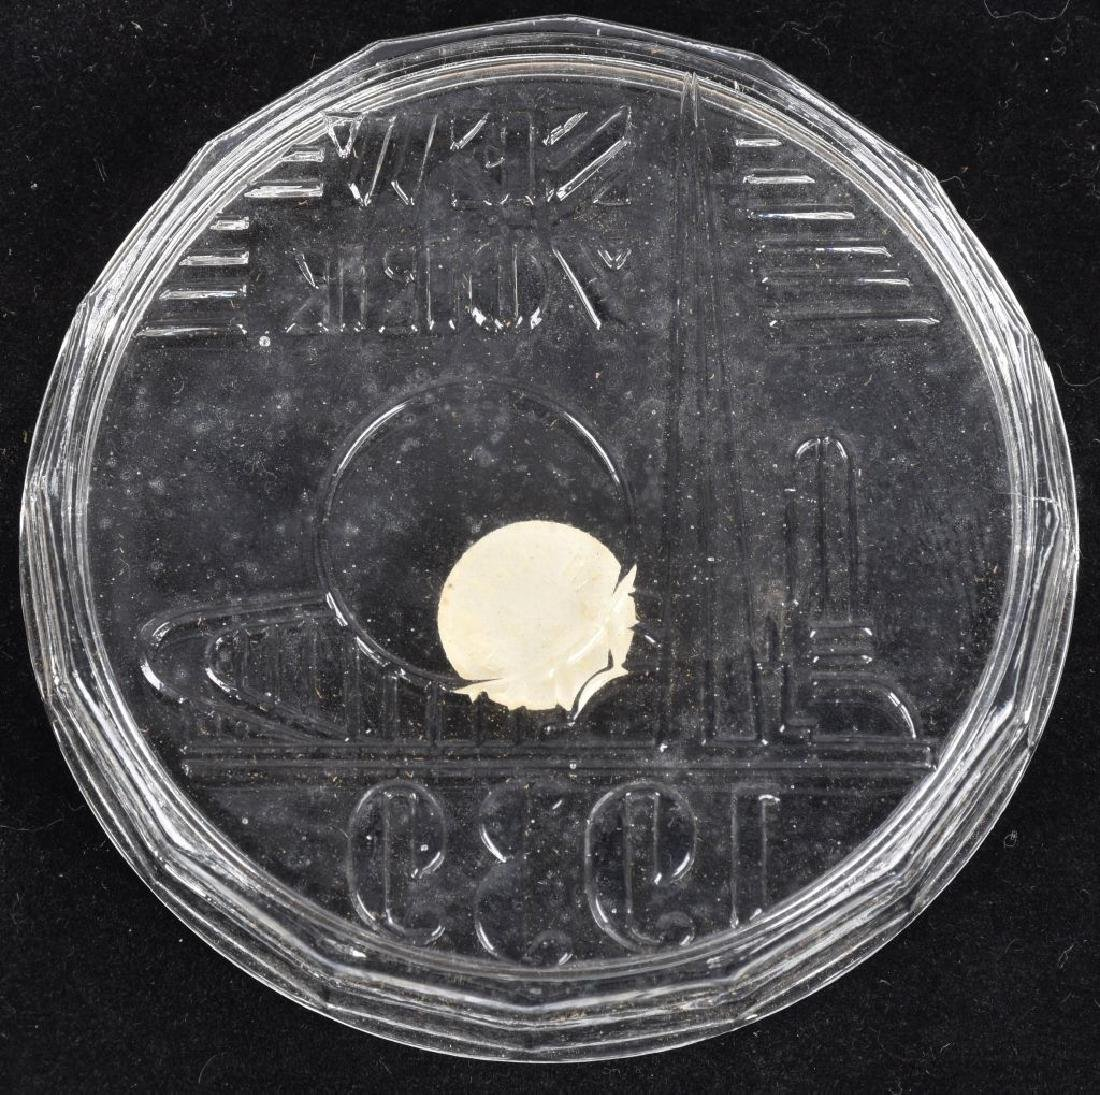 1939 NEW YORK WORLDS FAIR GLASS COASTER SET w/ BOX - 3